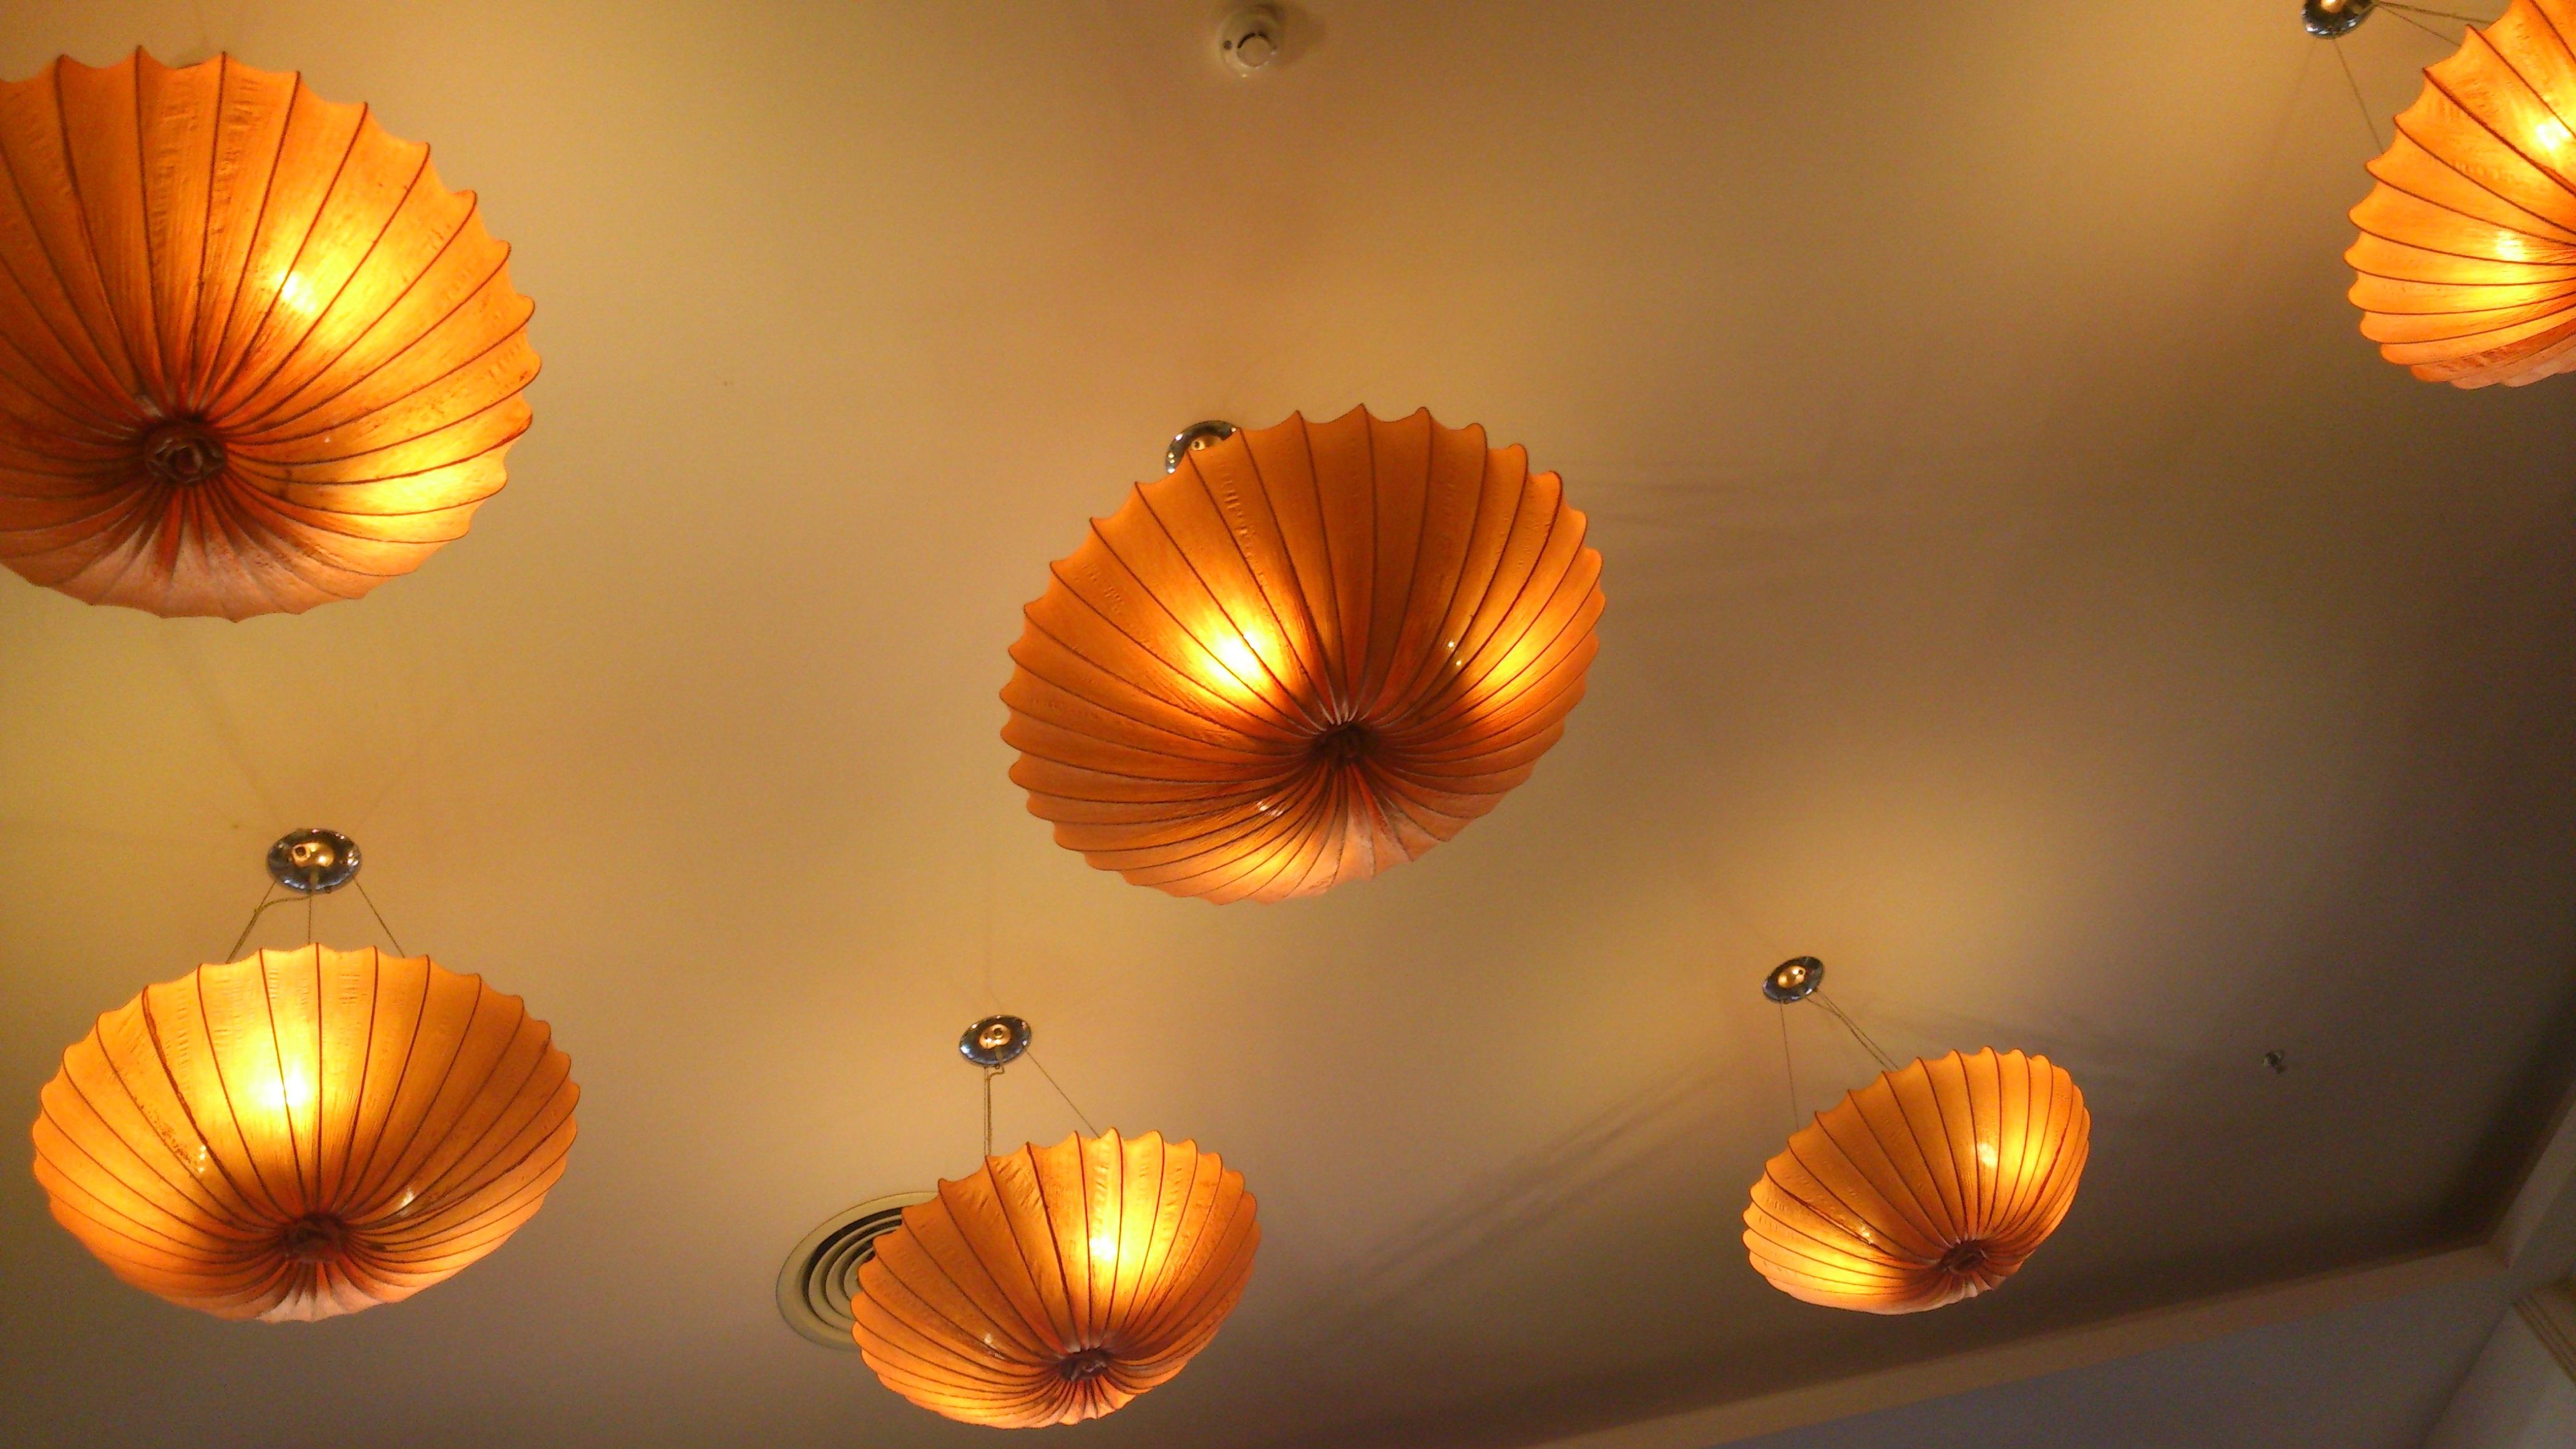 Free house sunlight flower petal ceiling orange